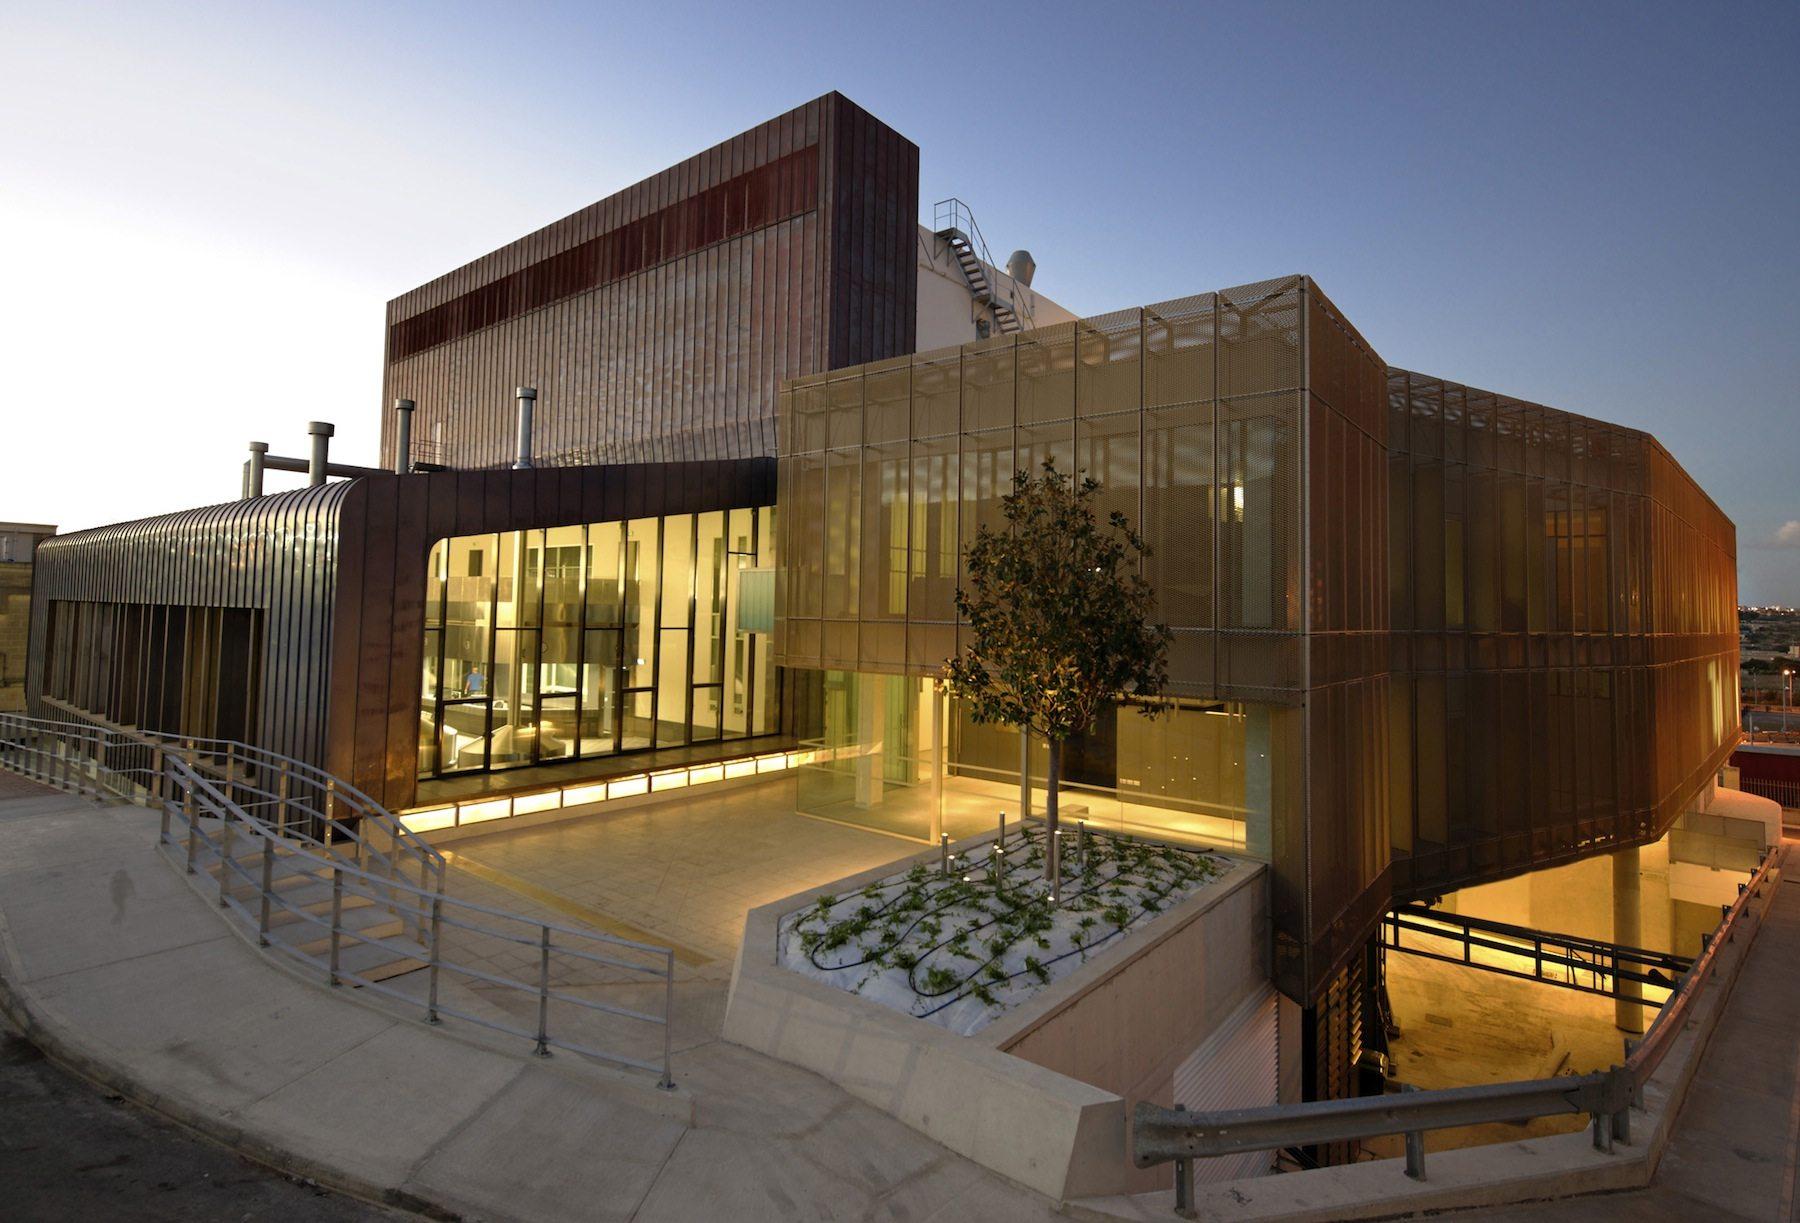 Farsons Brewery.  Project details. Date: 2006 – 2012. Client: Simonds Farsons Cisk plc. Value: 4,5 million Euro. Location: Mriehel, Malta. Lighting design: Franck Franjou. Awards: World Architecture Festival Singapore shortlisting, 2013.